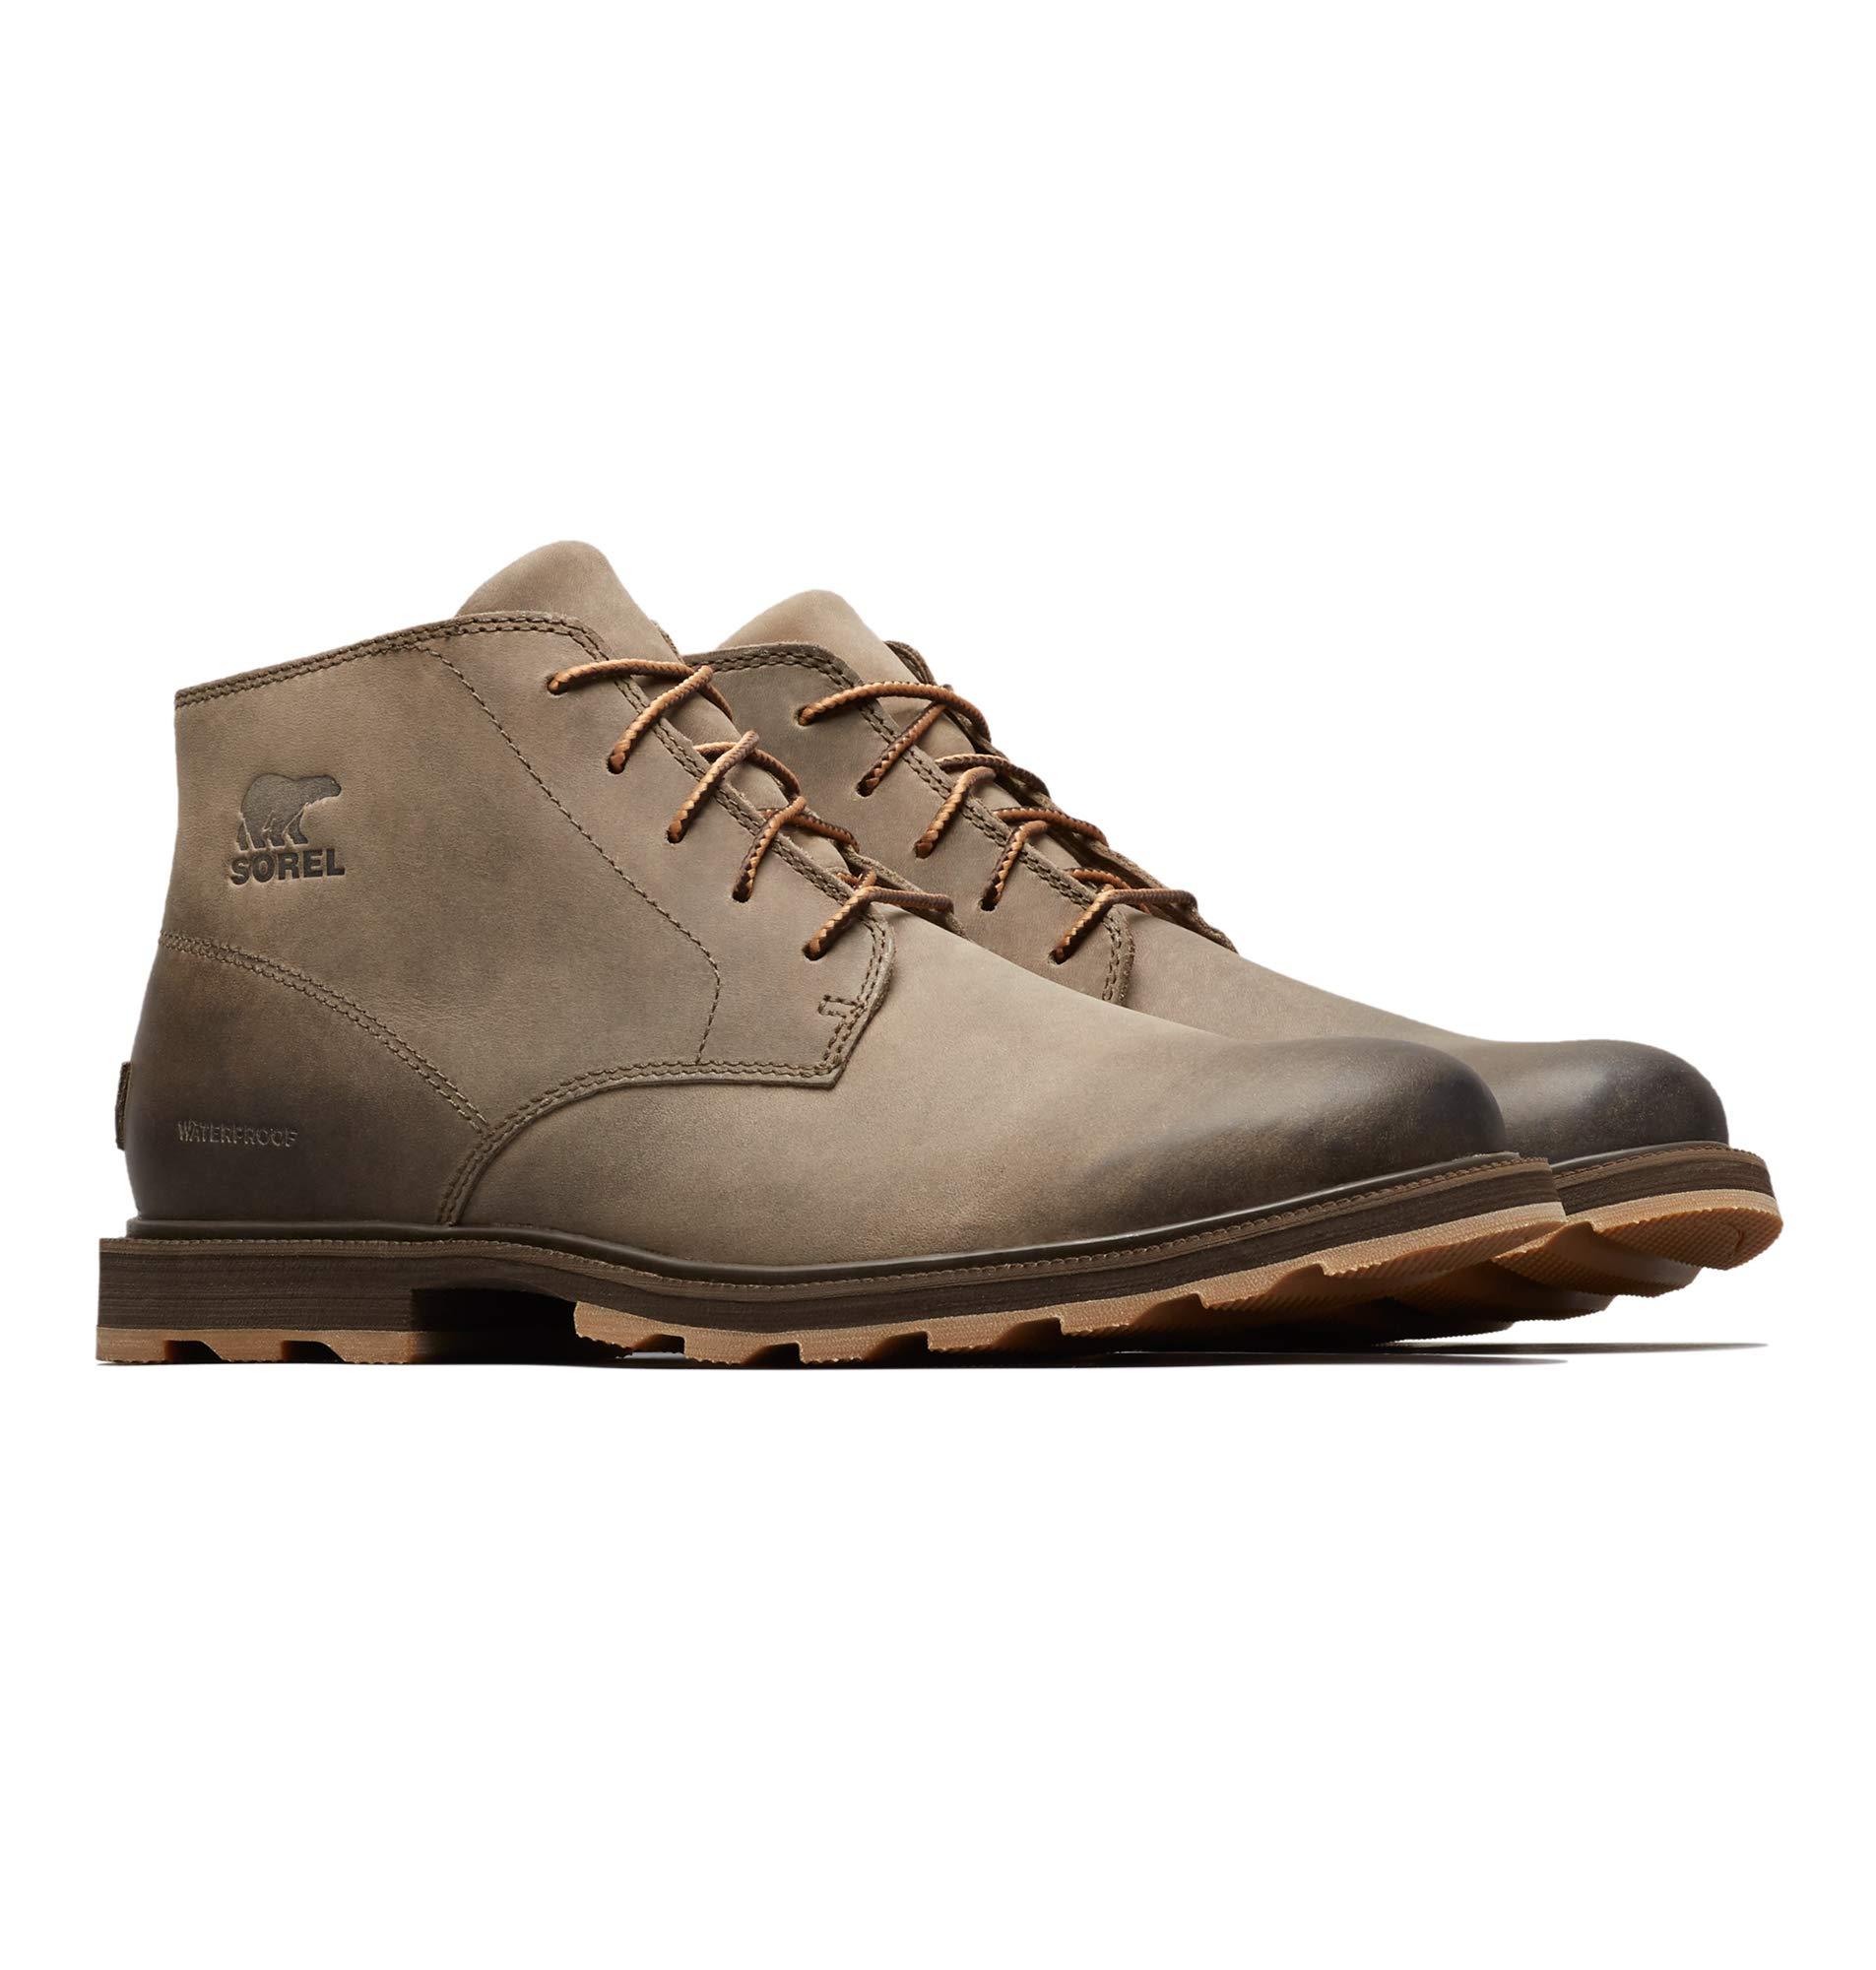 Madson Chukka Waterproof Boots, Leather